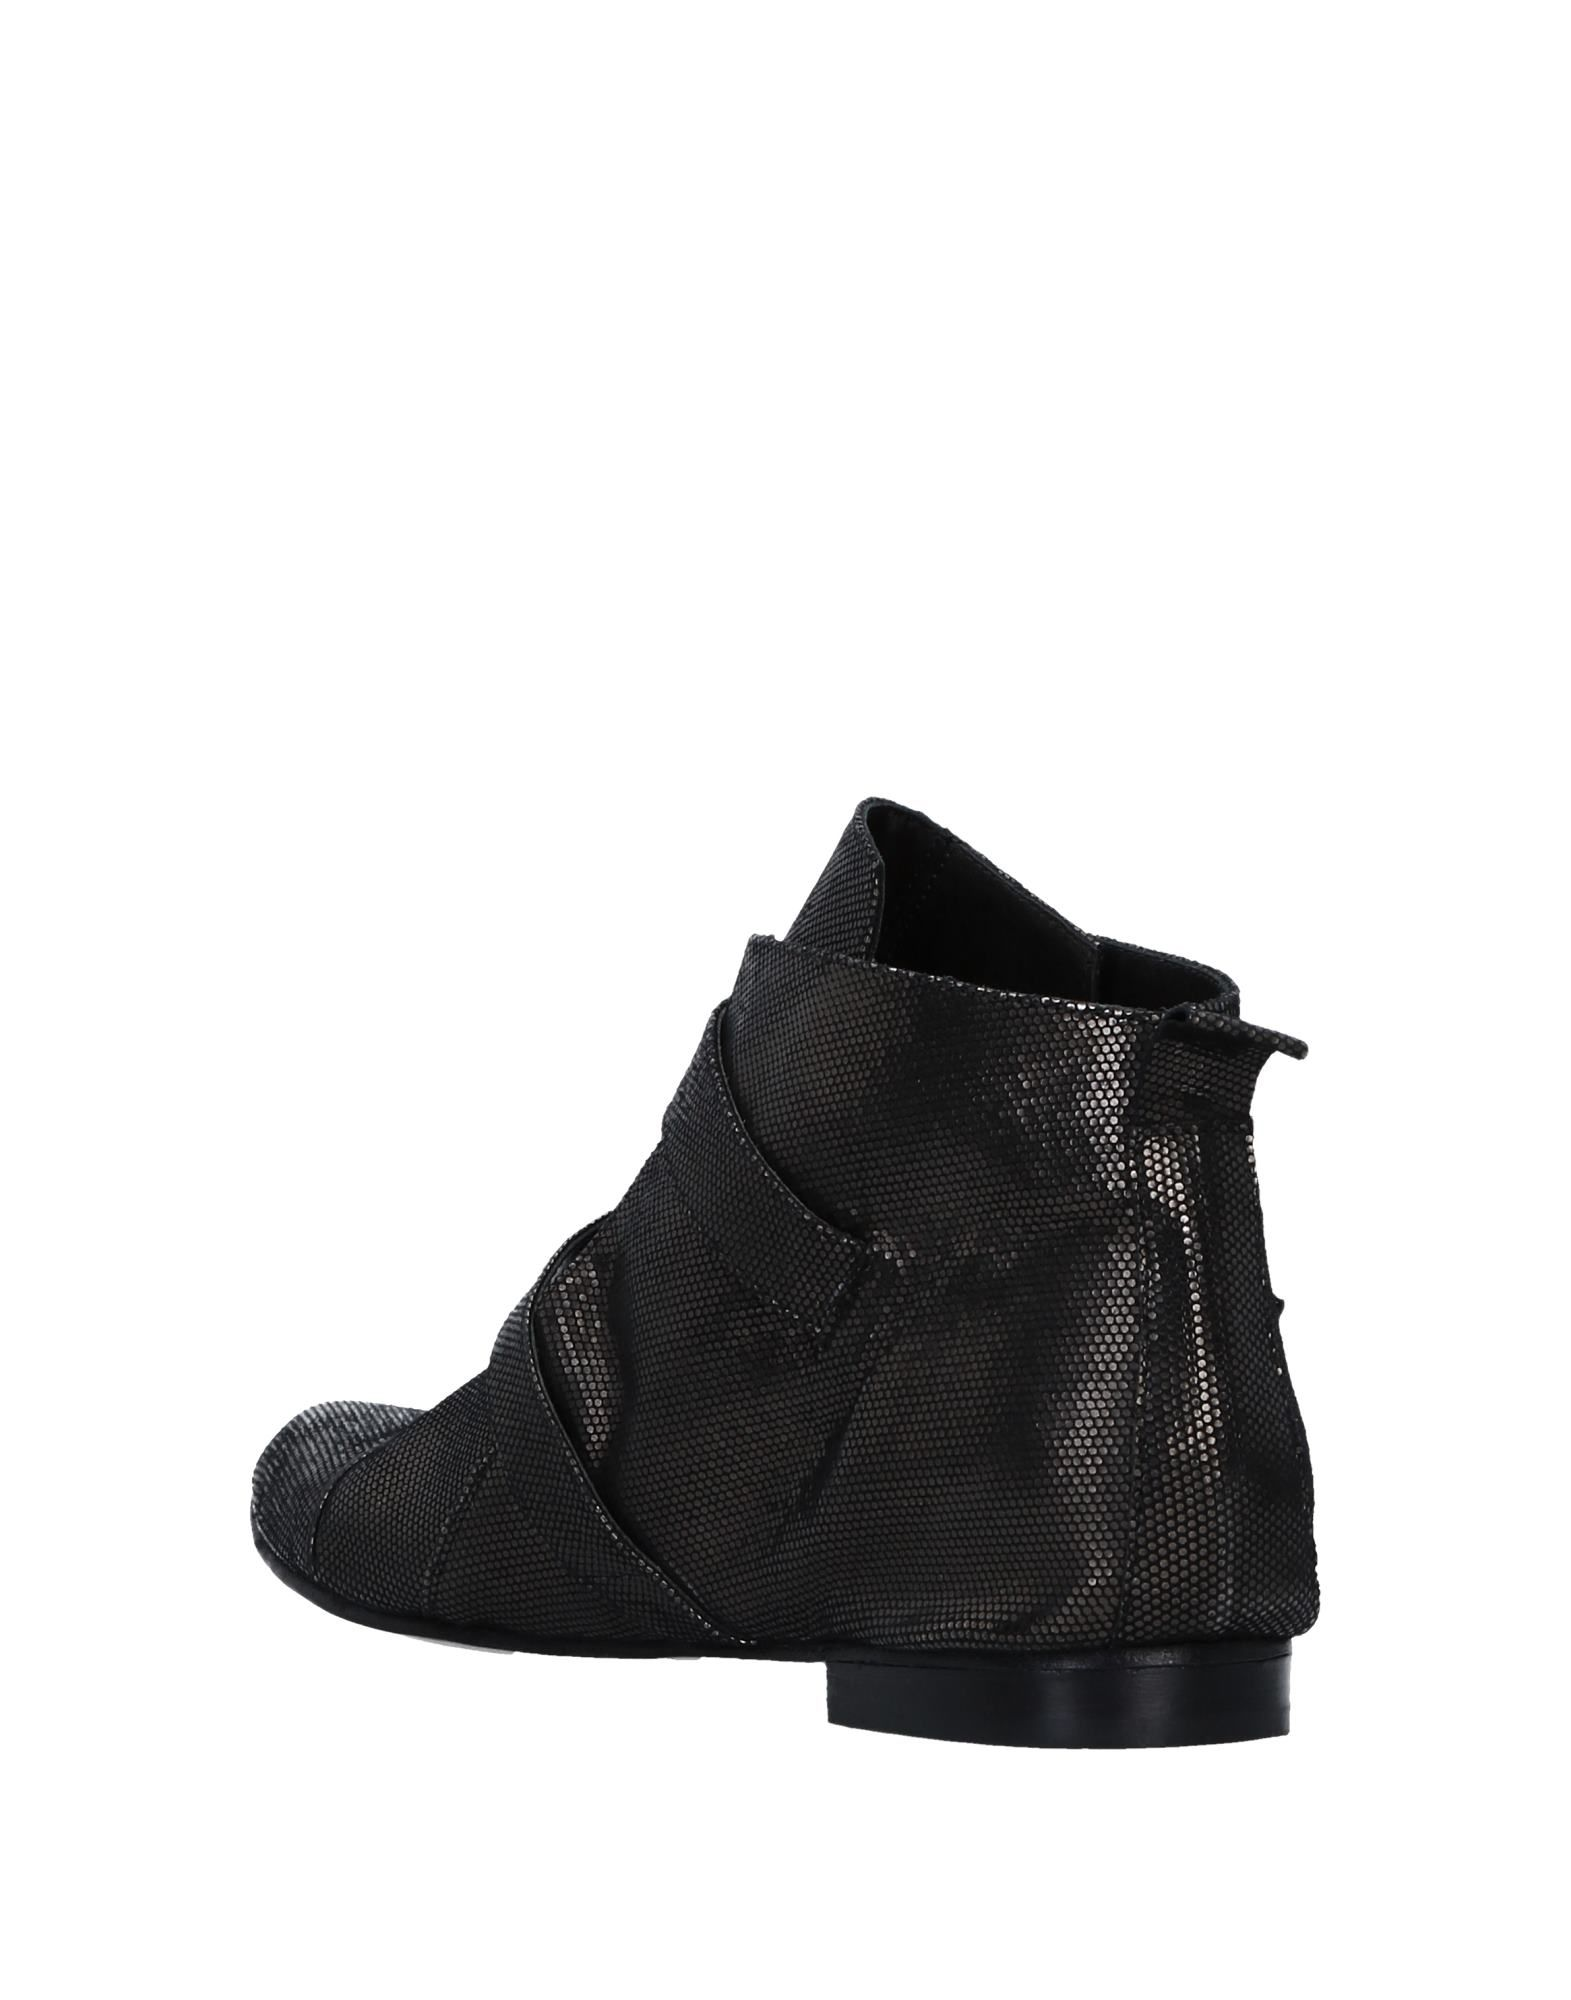 Kudetà Stiefelette Damen    11540105OG Heiße Schuhe 05dd4d